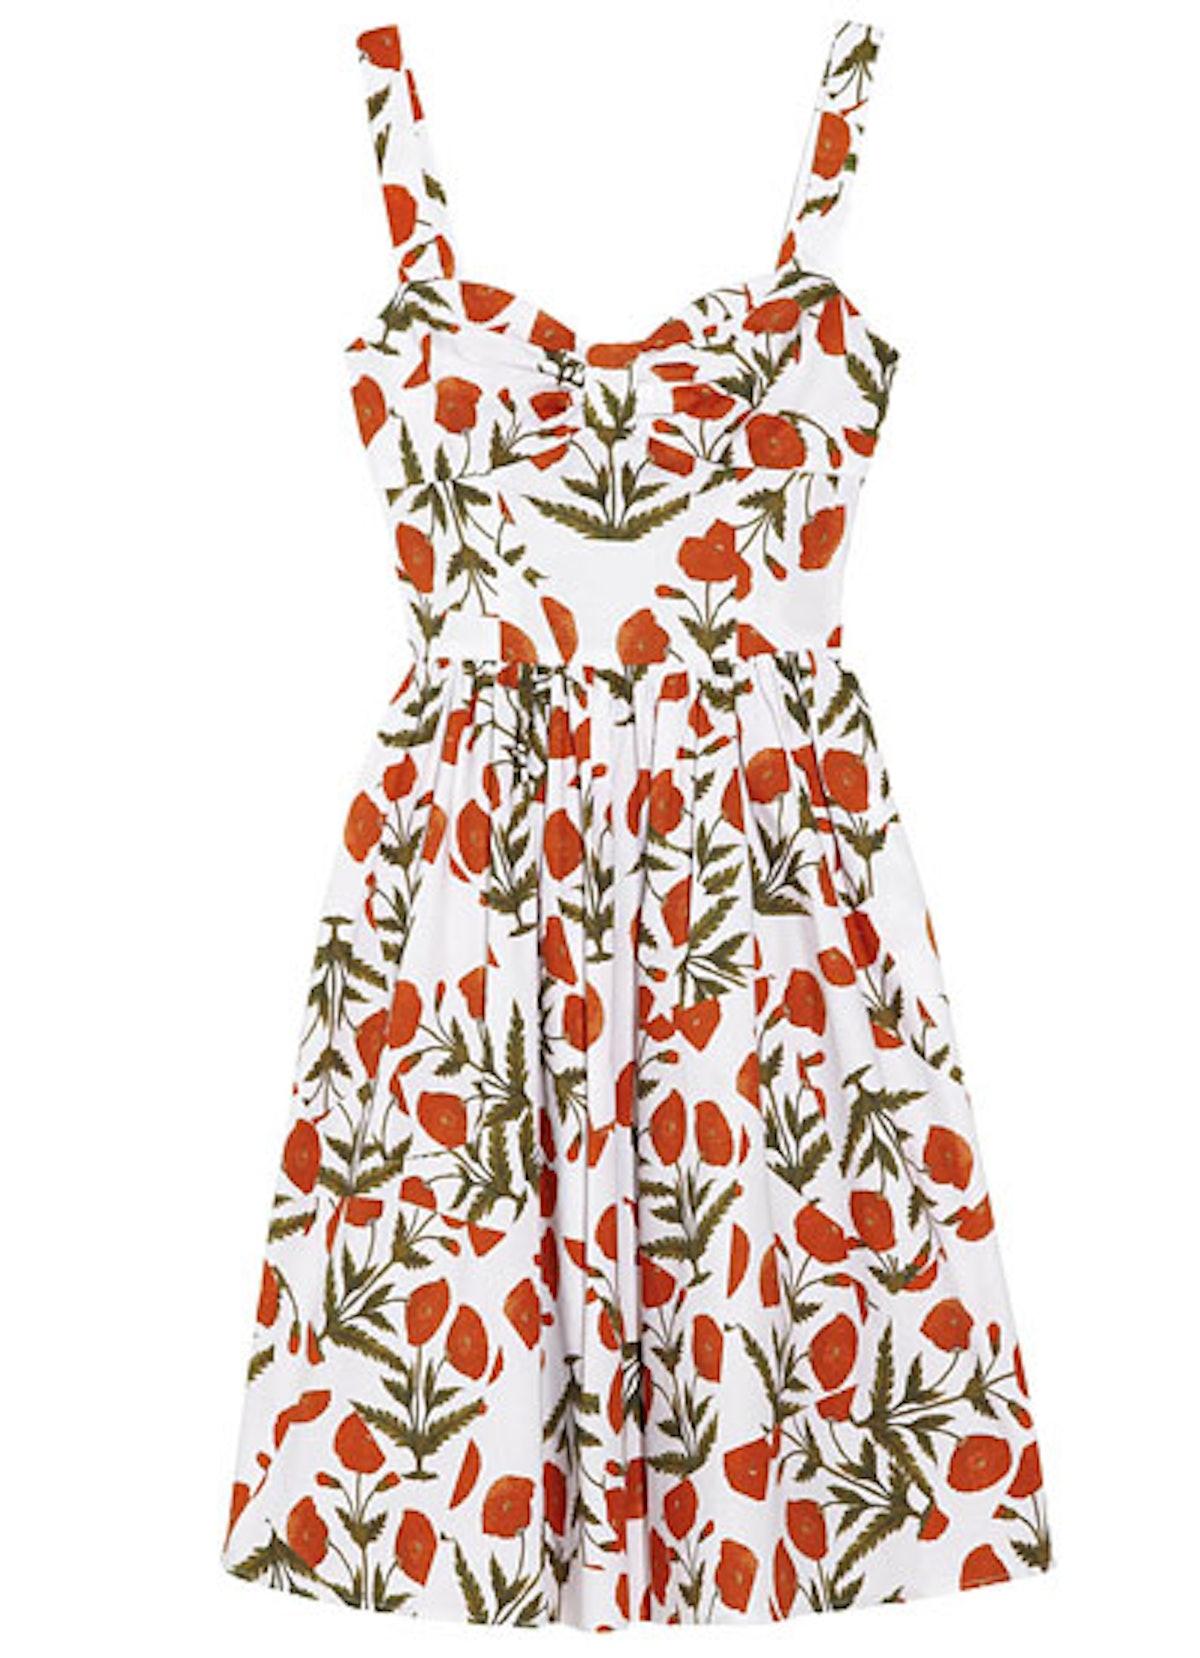 fass-floral-dresses-08-v.jpg